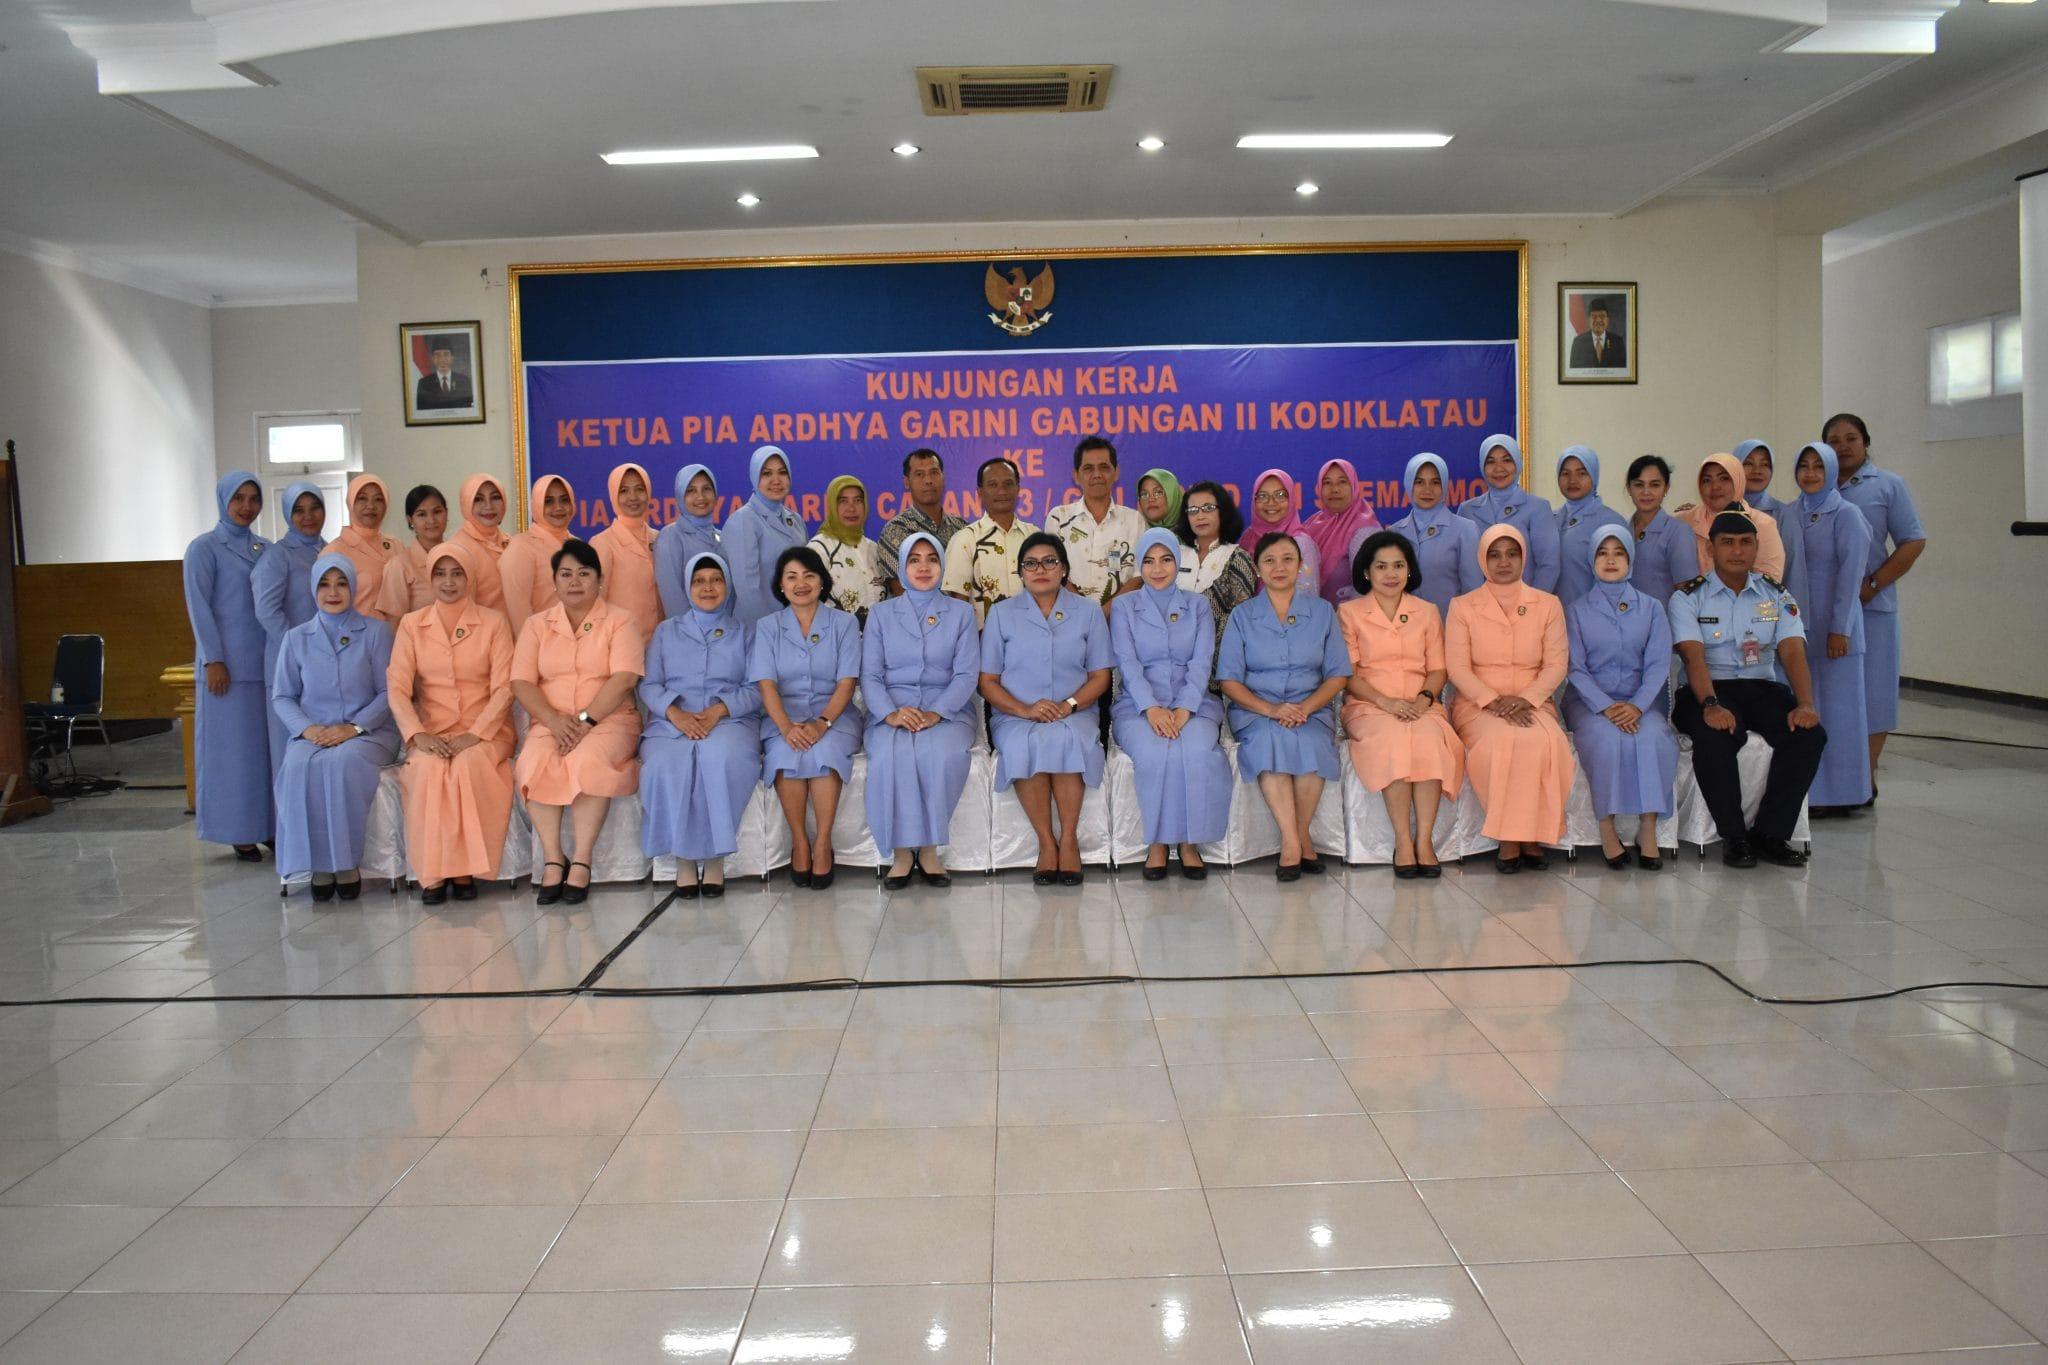 Tatap Muka Ketua PIA AG Kodiklatau Dengan Anggota PIA Lanud Smo